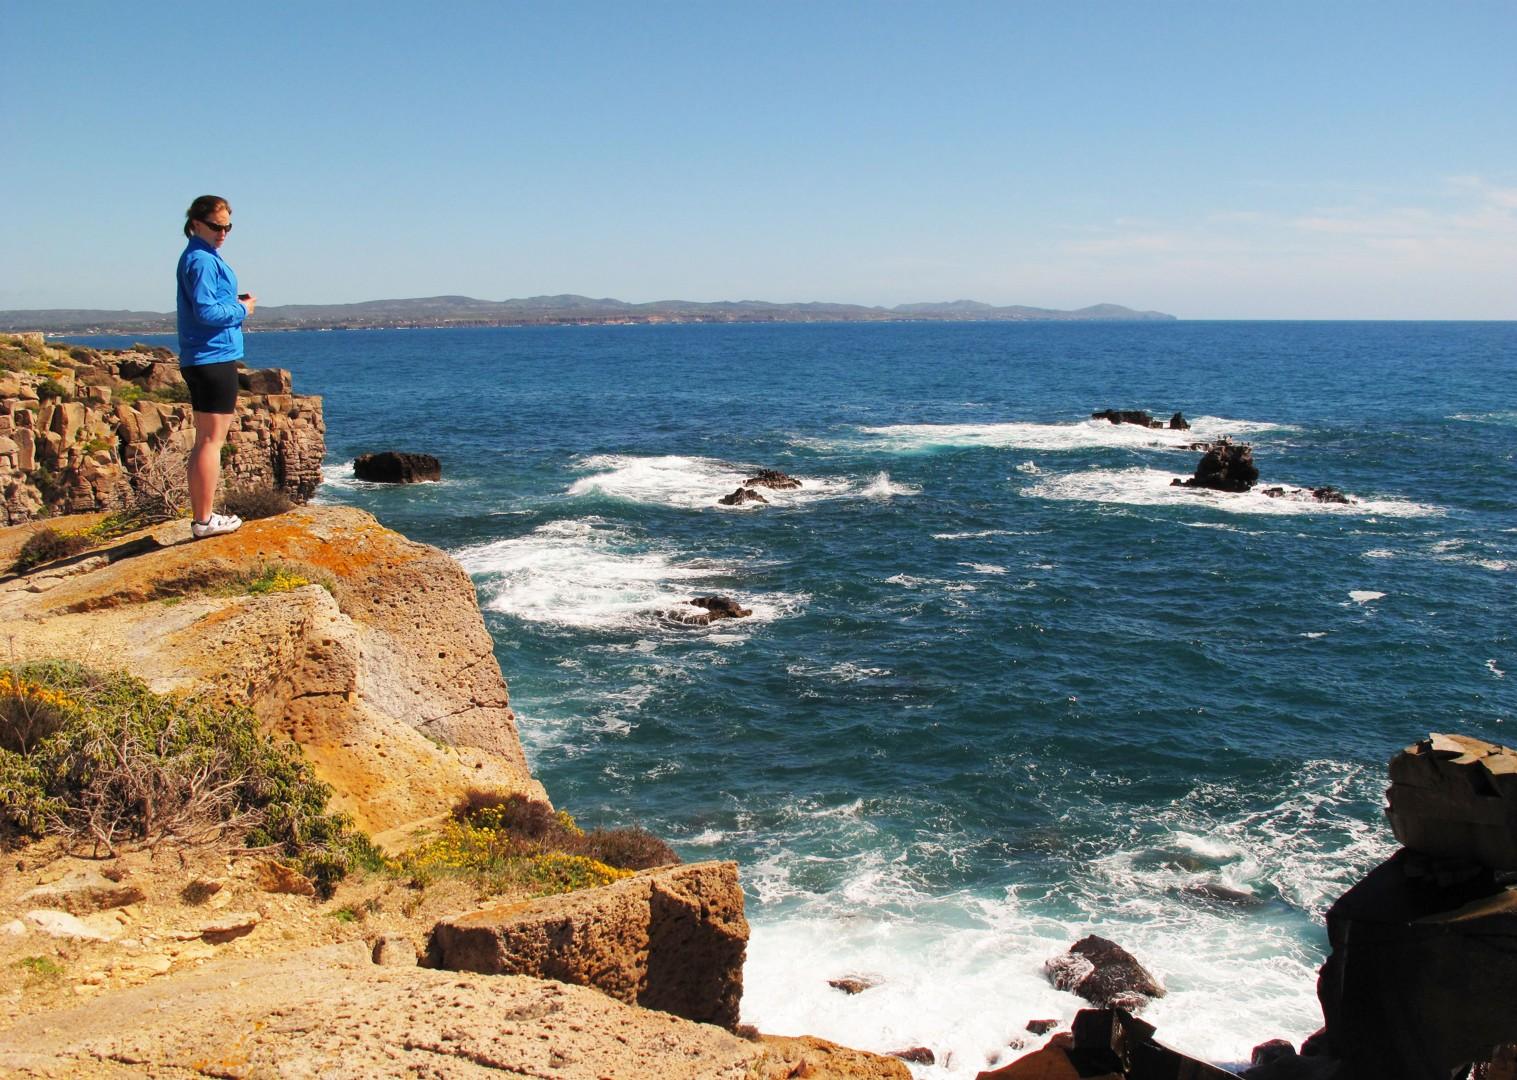 sea-cliffs-islands-sardinia.jpg - Italy - Sardinia - Island Flavours - Self-Guided Leisure Cycling Holiday - Italia Leisure and Family Cycling